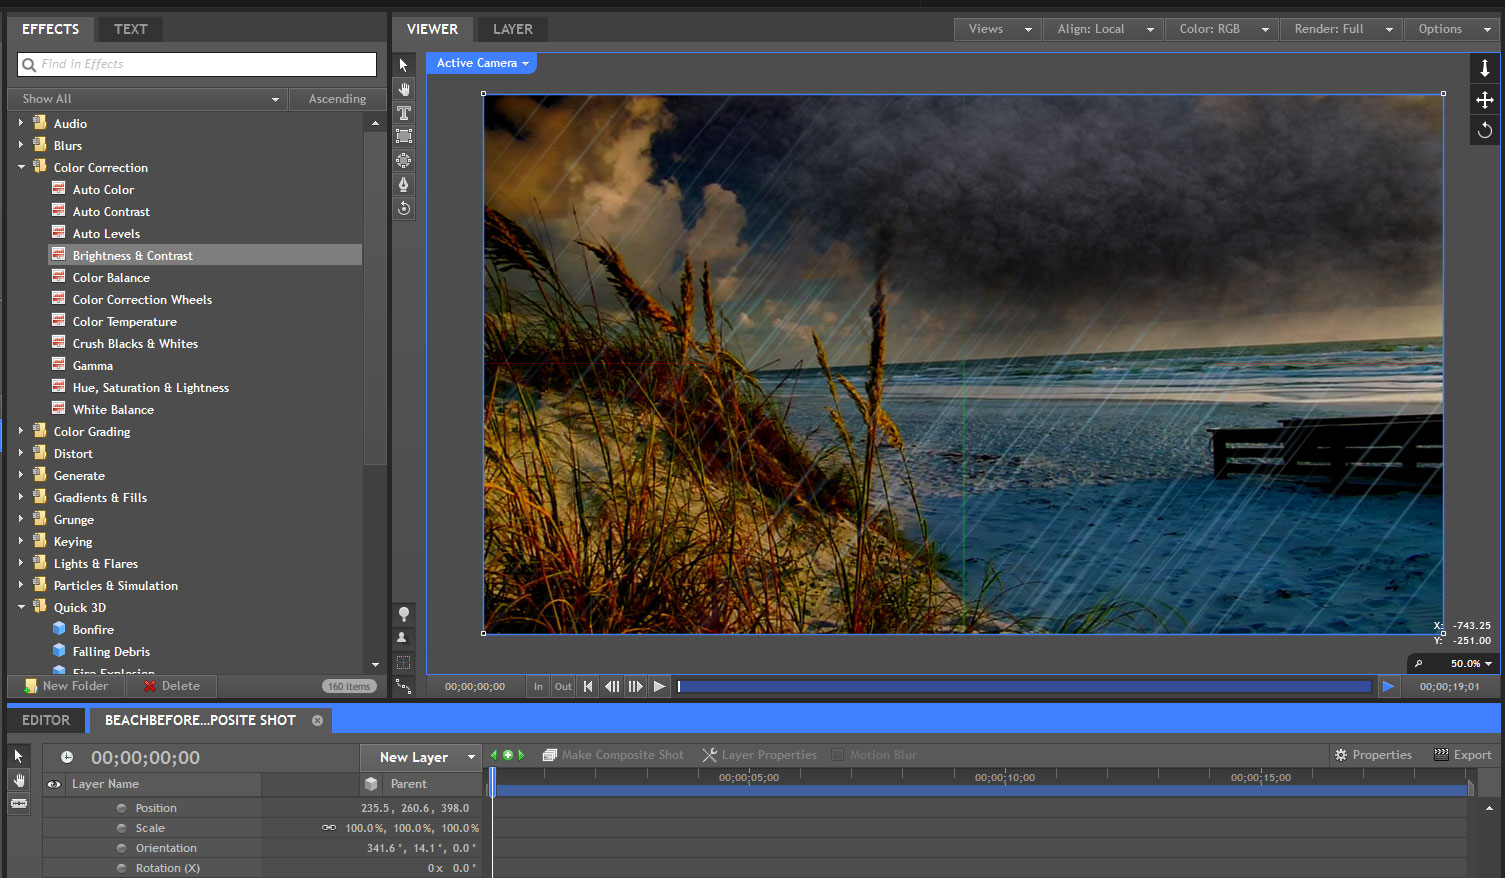 Sony vegas pro 11 video effects download bookingsoft for Sony vegas effects download